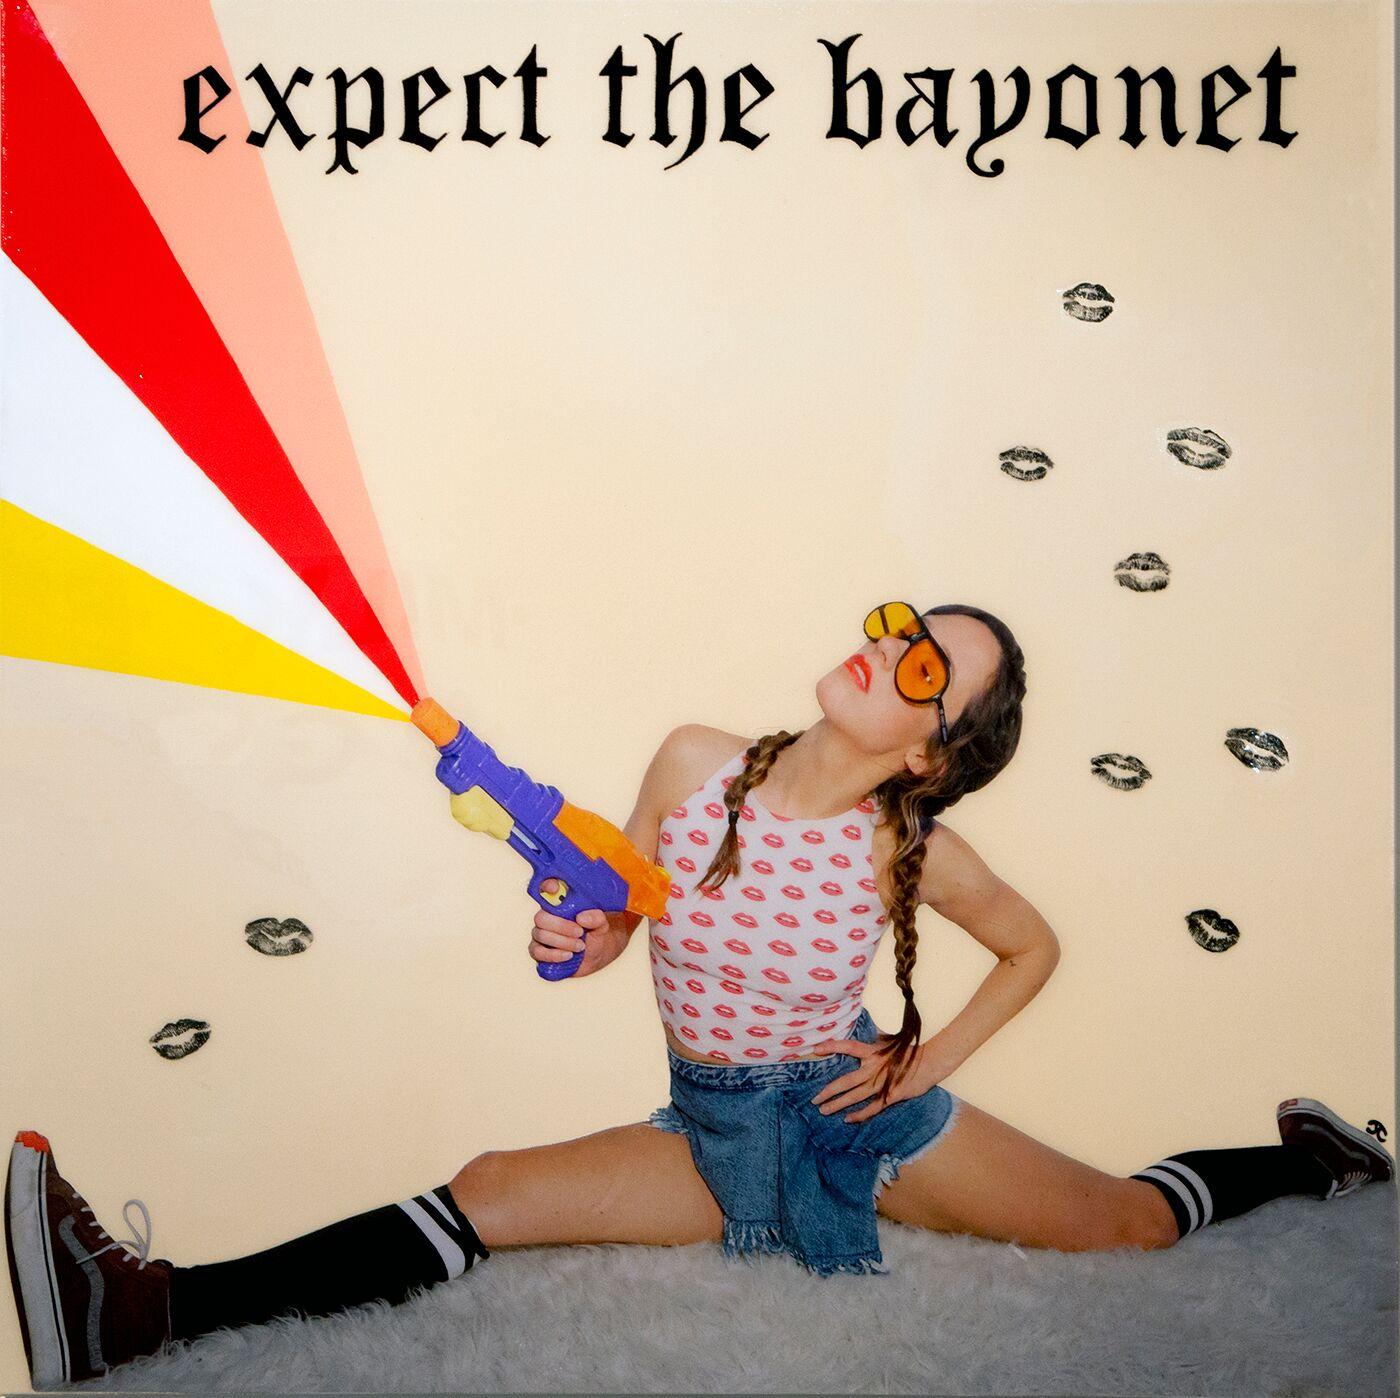 Expect the Bayonet